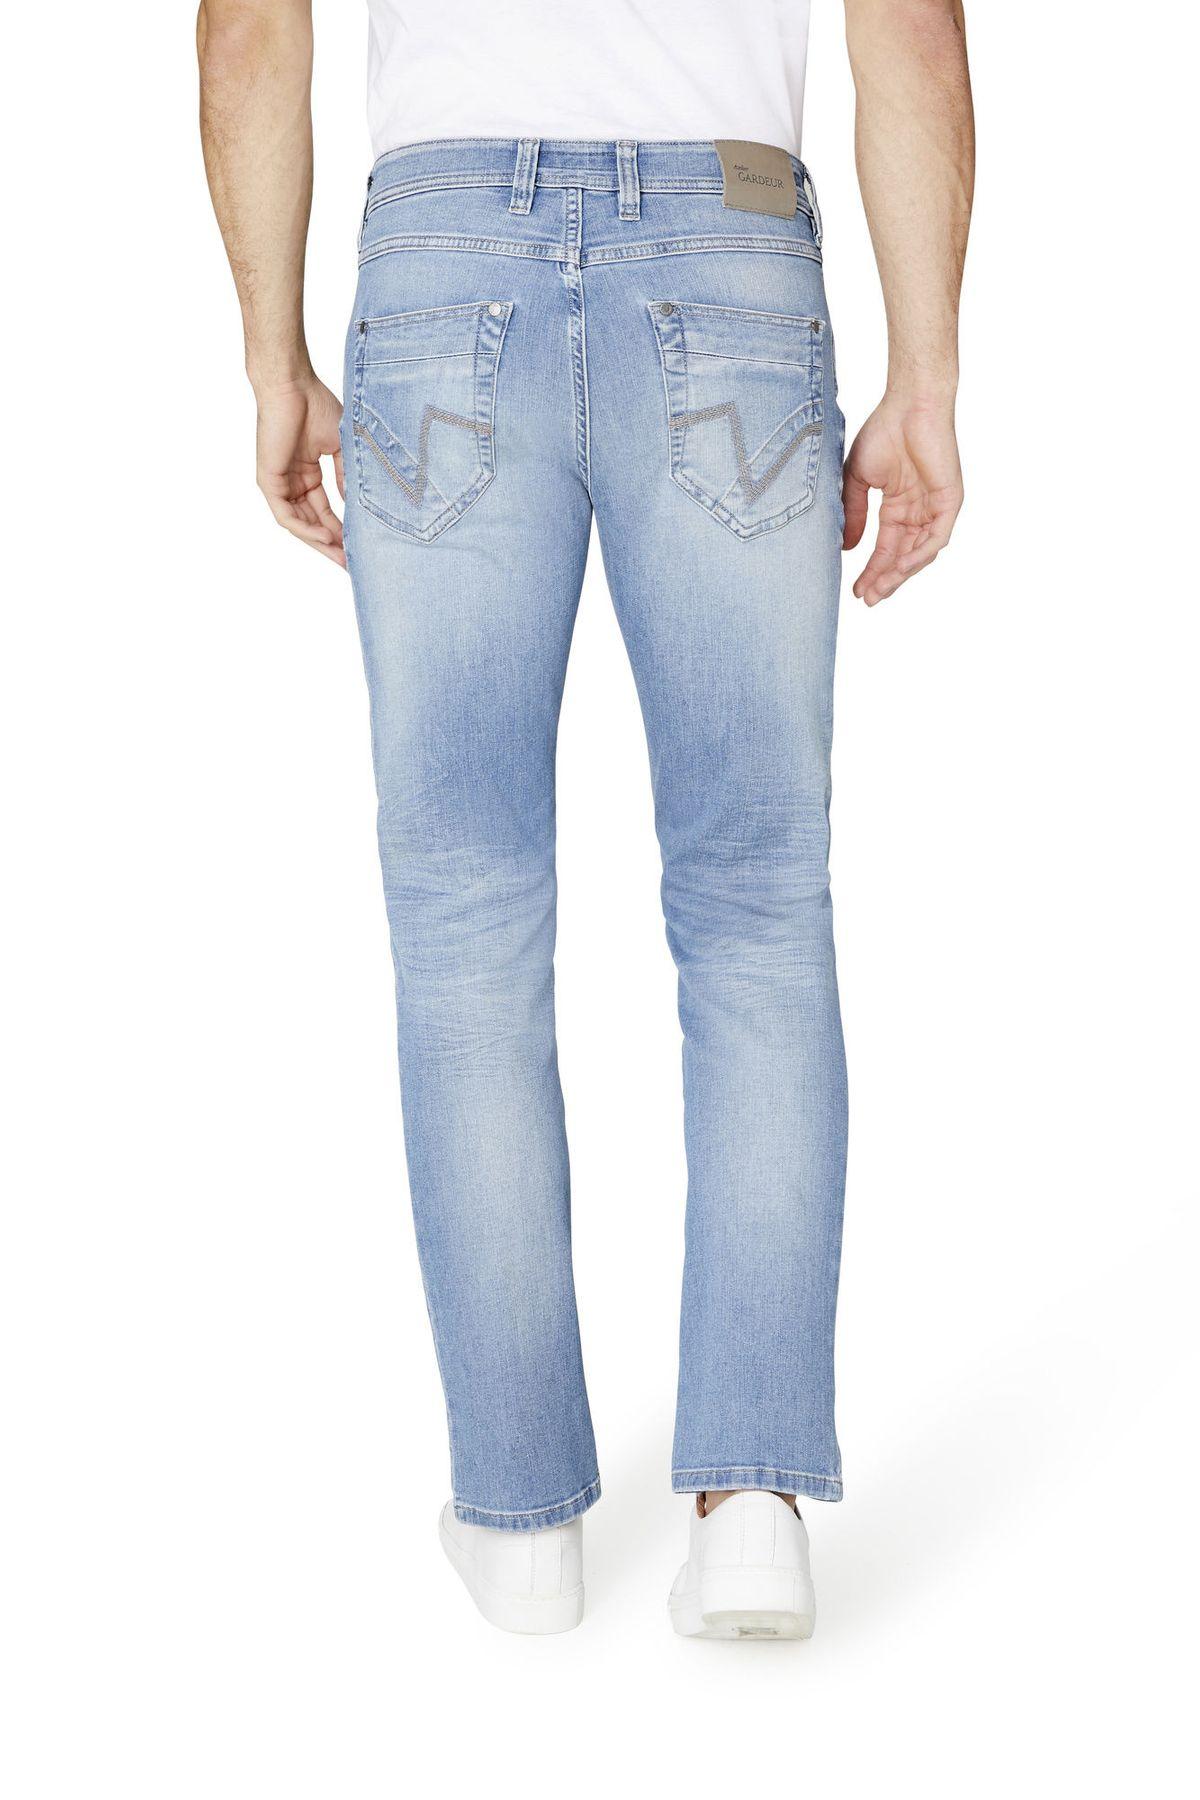 Atelier Gardeur - Modern Fit - Herren 5-Pocket Jeans, Denimstretch, Bill-8 (470391) – Bild 3